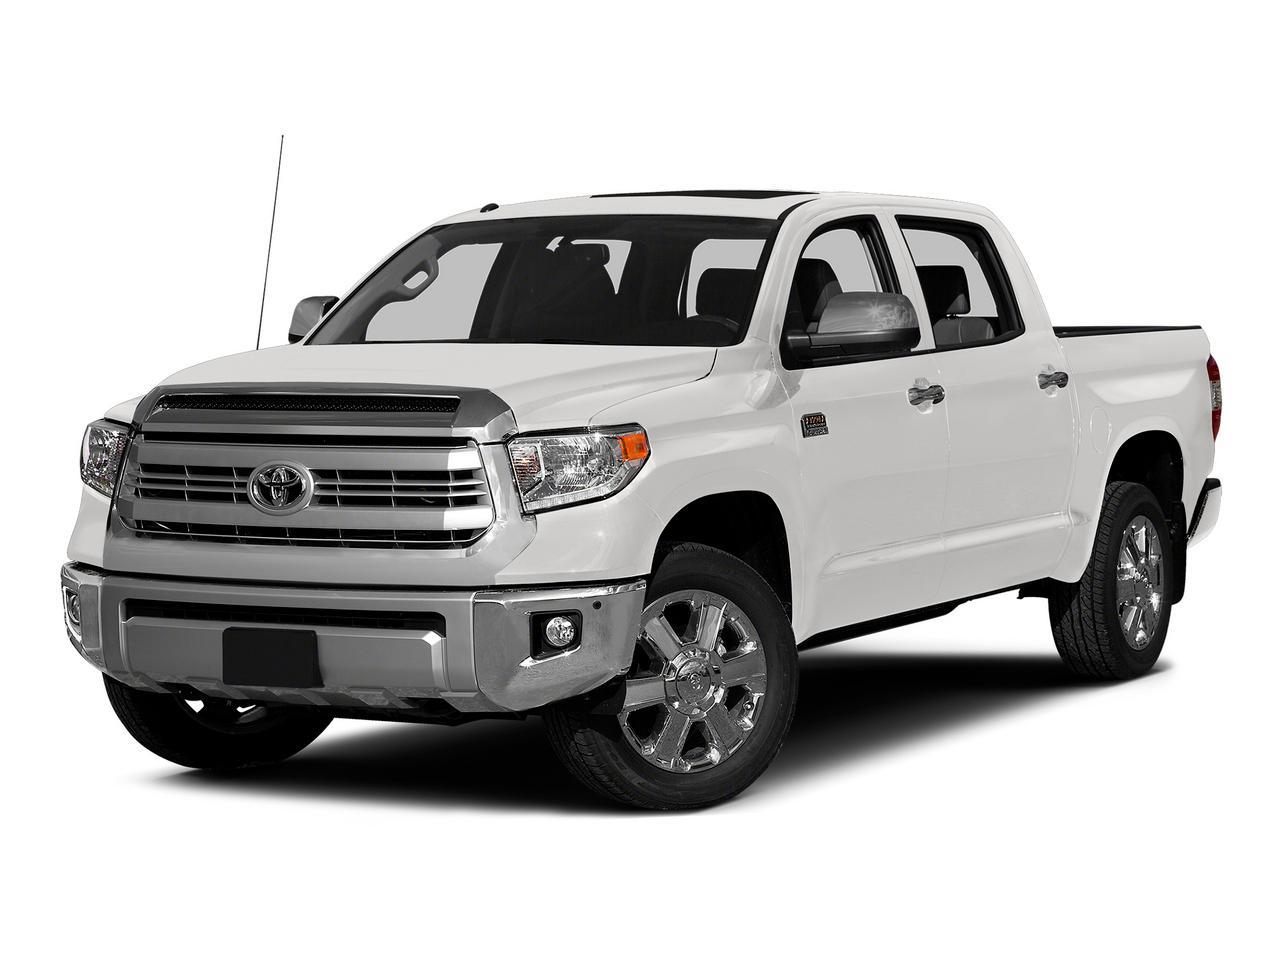 2015 Toyota Tundra 4WD Truck Vehicle Photo in Kingwood, TX 77339